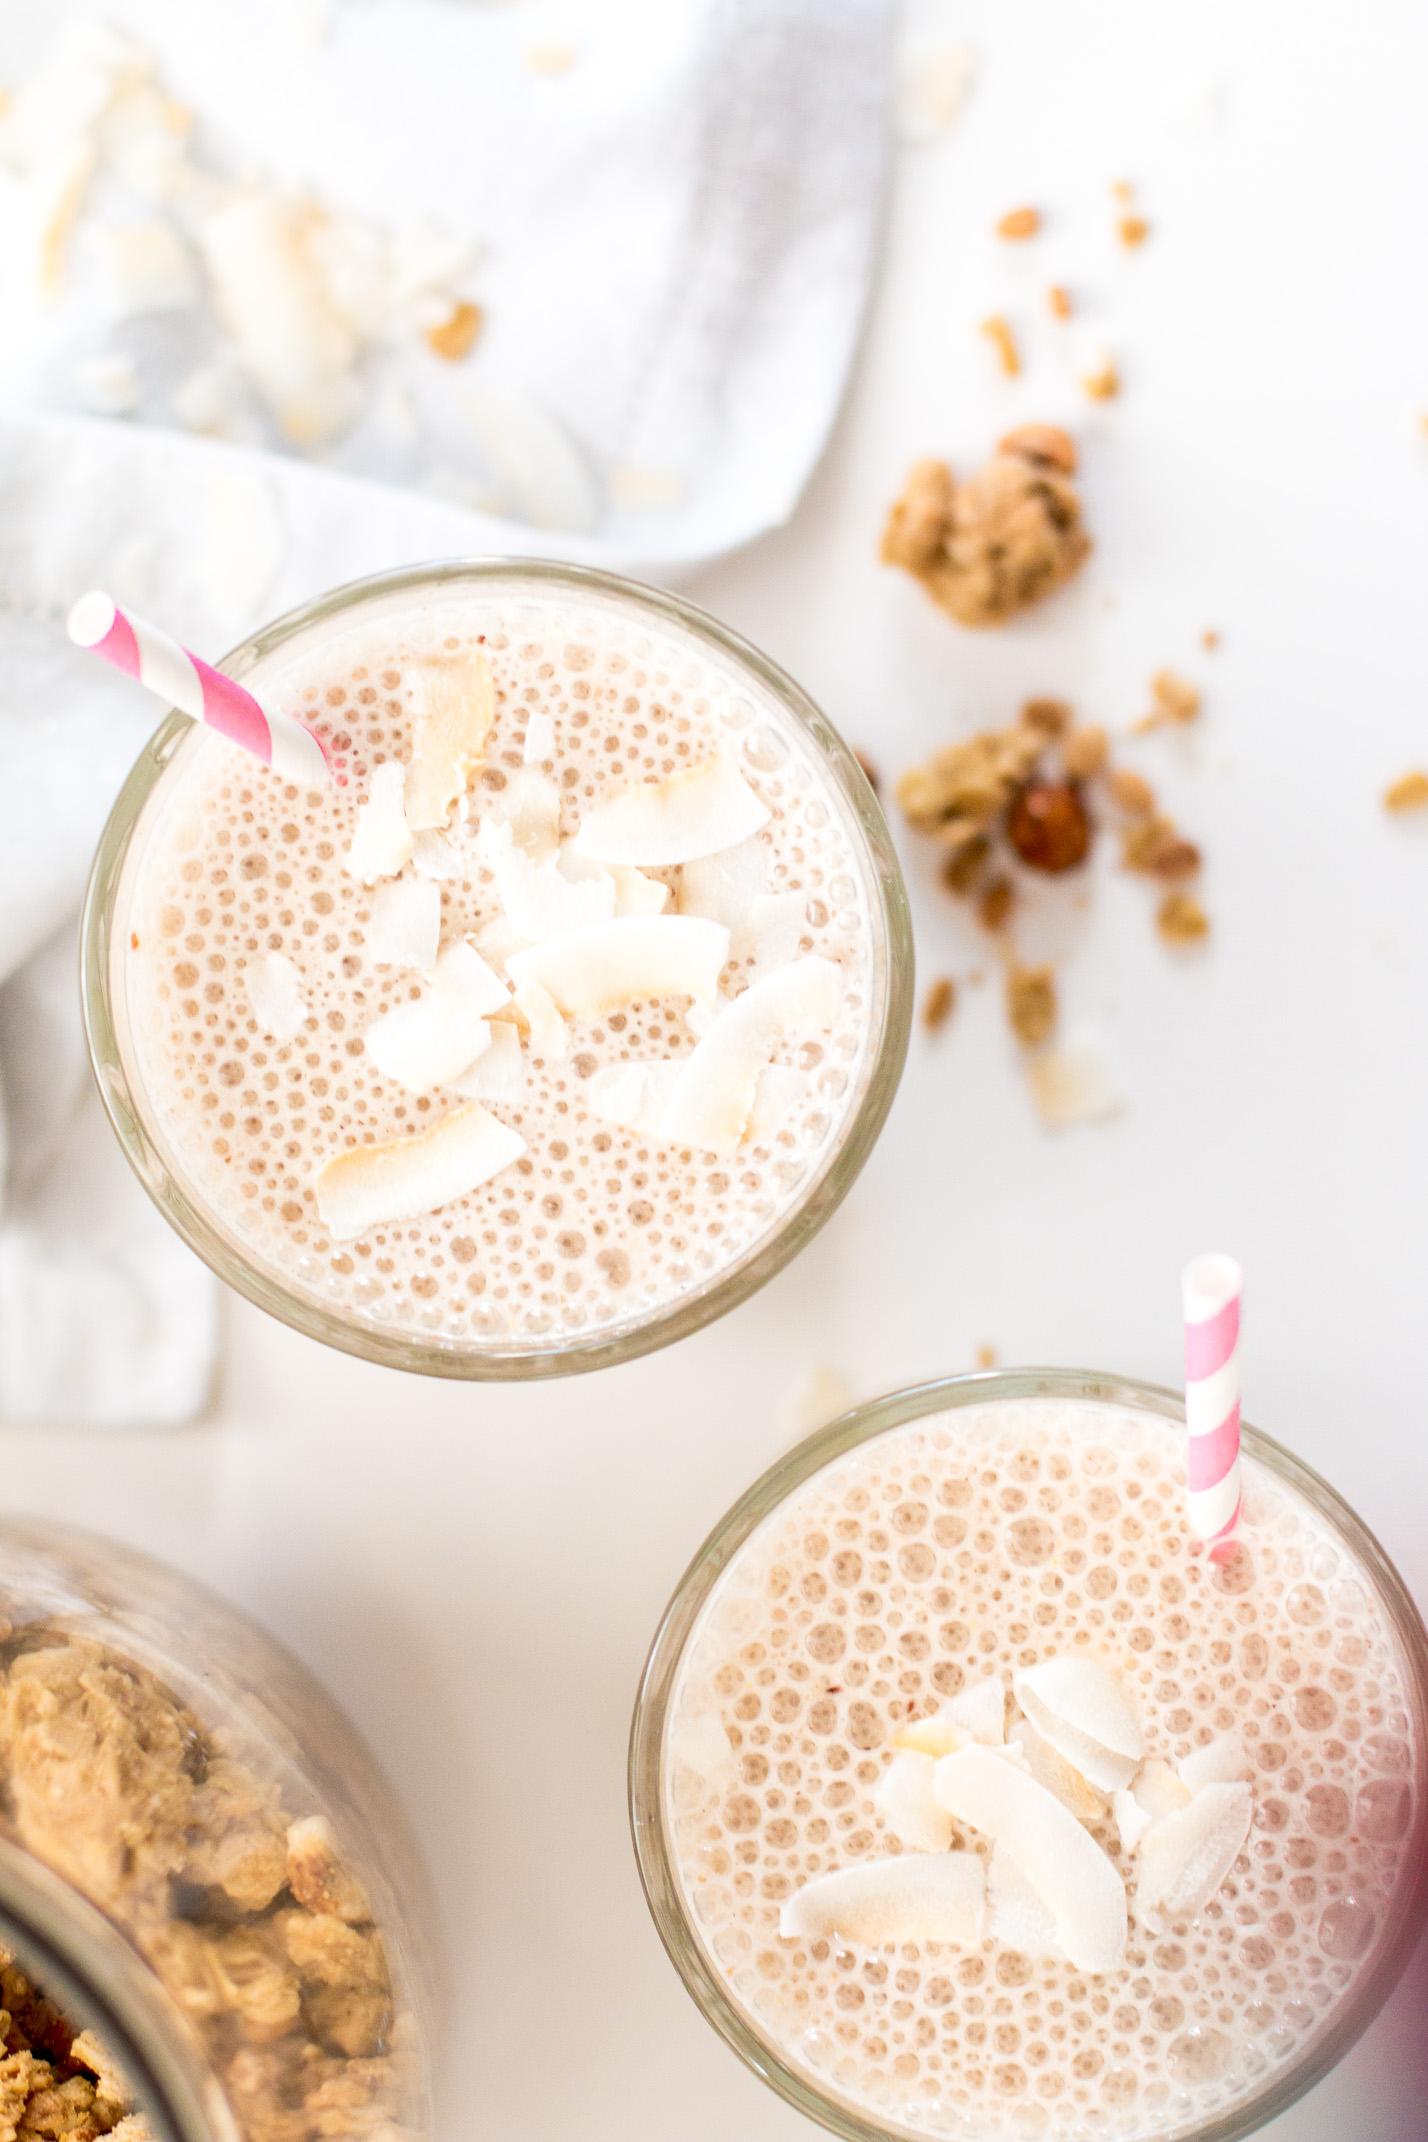 Creamy Cashew Breakfast Smoothie - Vegan | Love Daily Dose